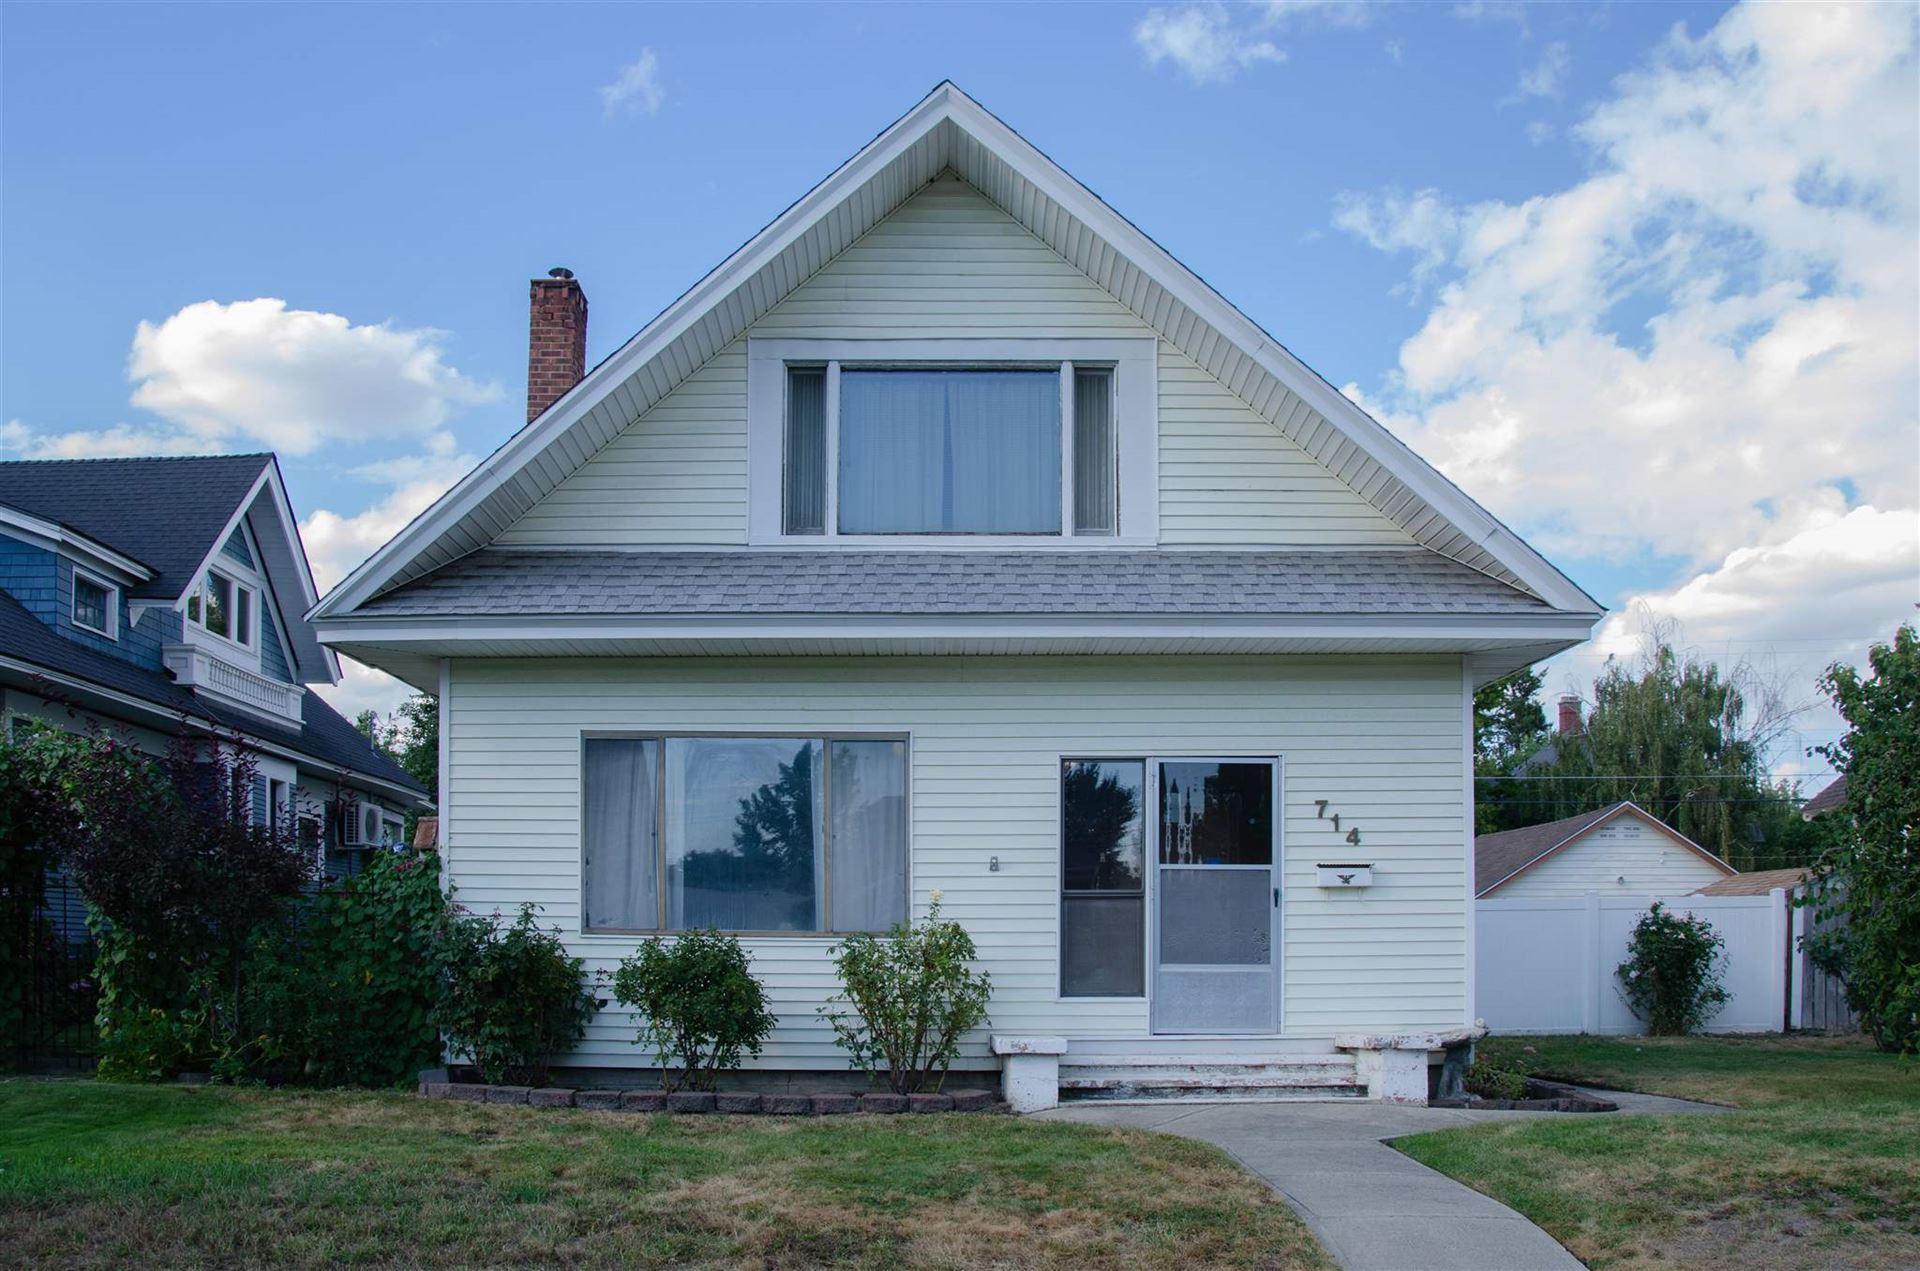 714 W CLEVELAND Ave, Spokane, WA 99205 - #: 202122200